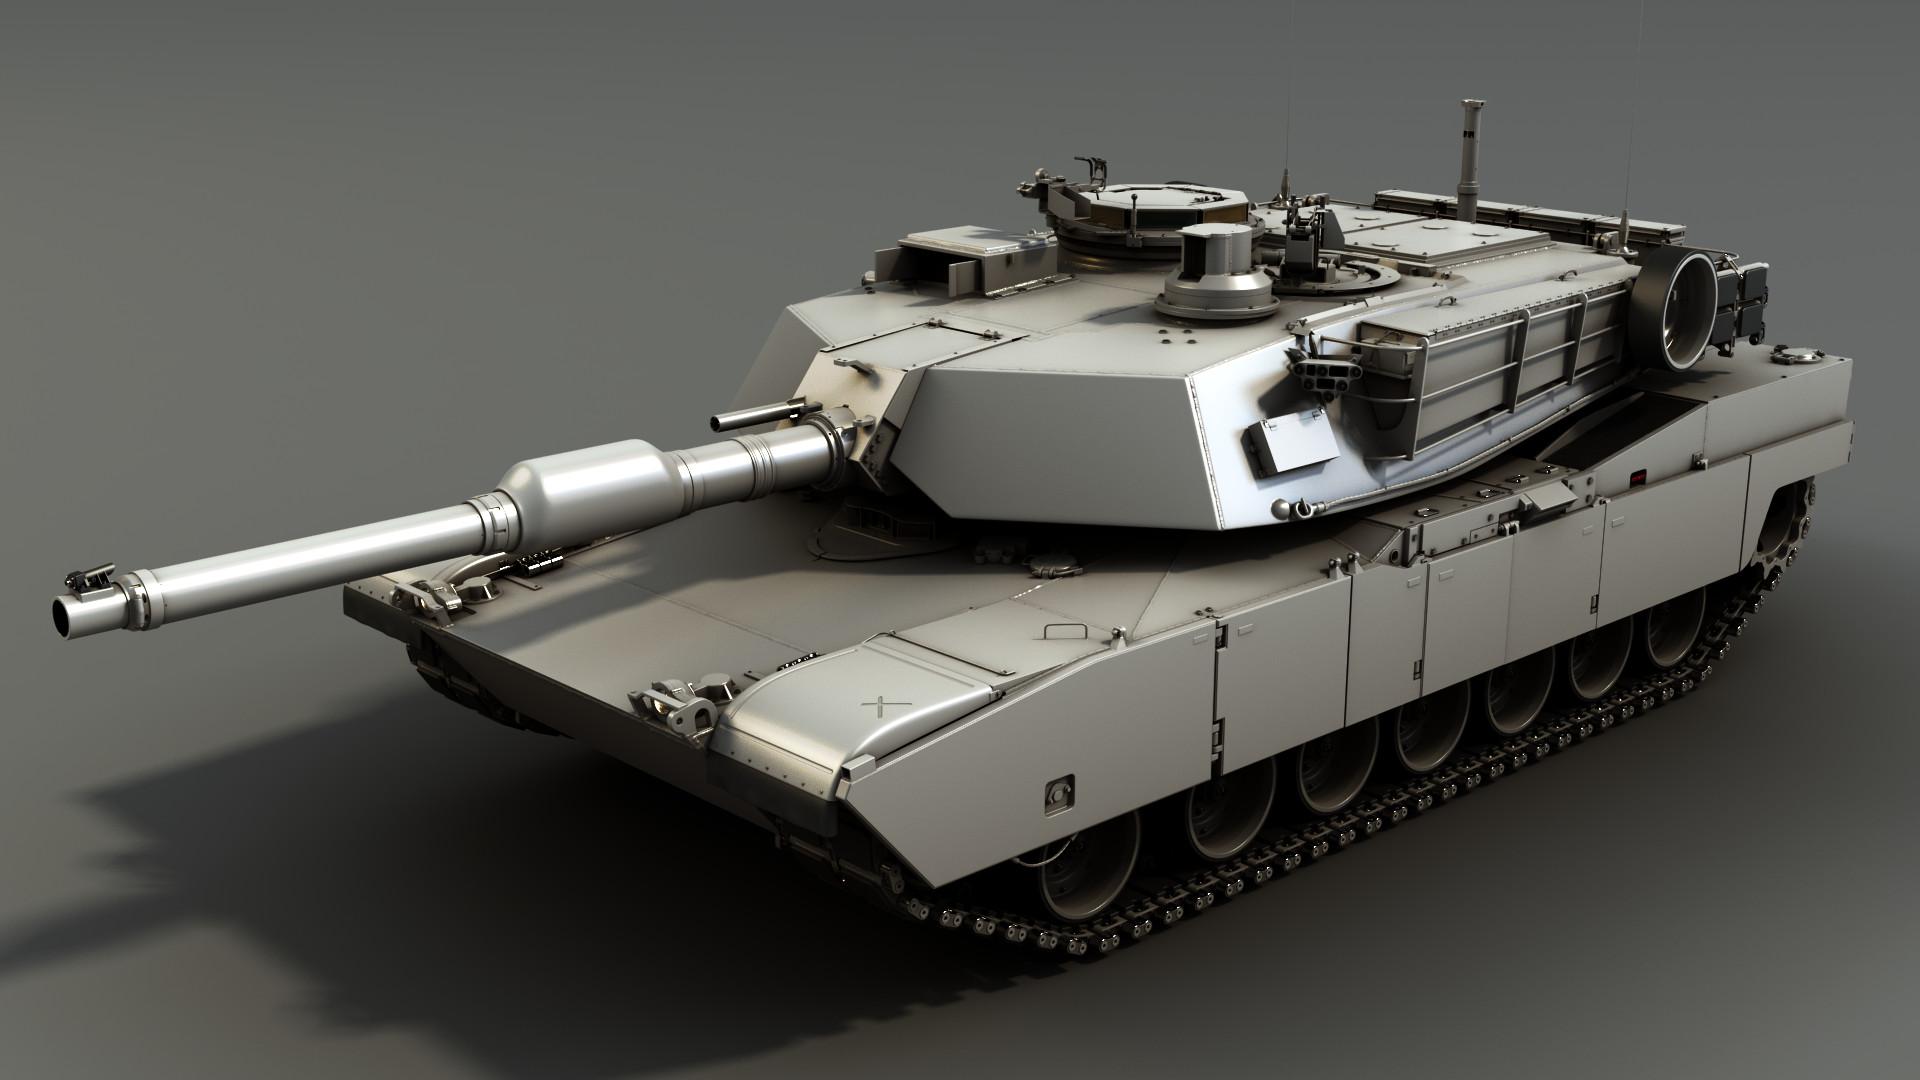 M1A2_SEP_Abrams_01v2.png